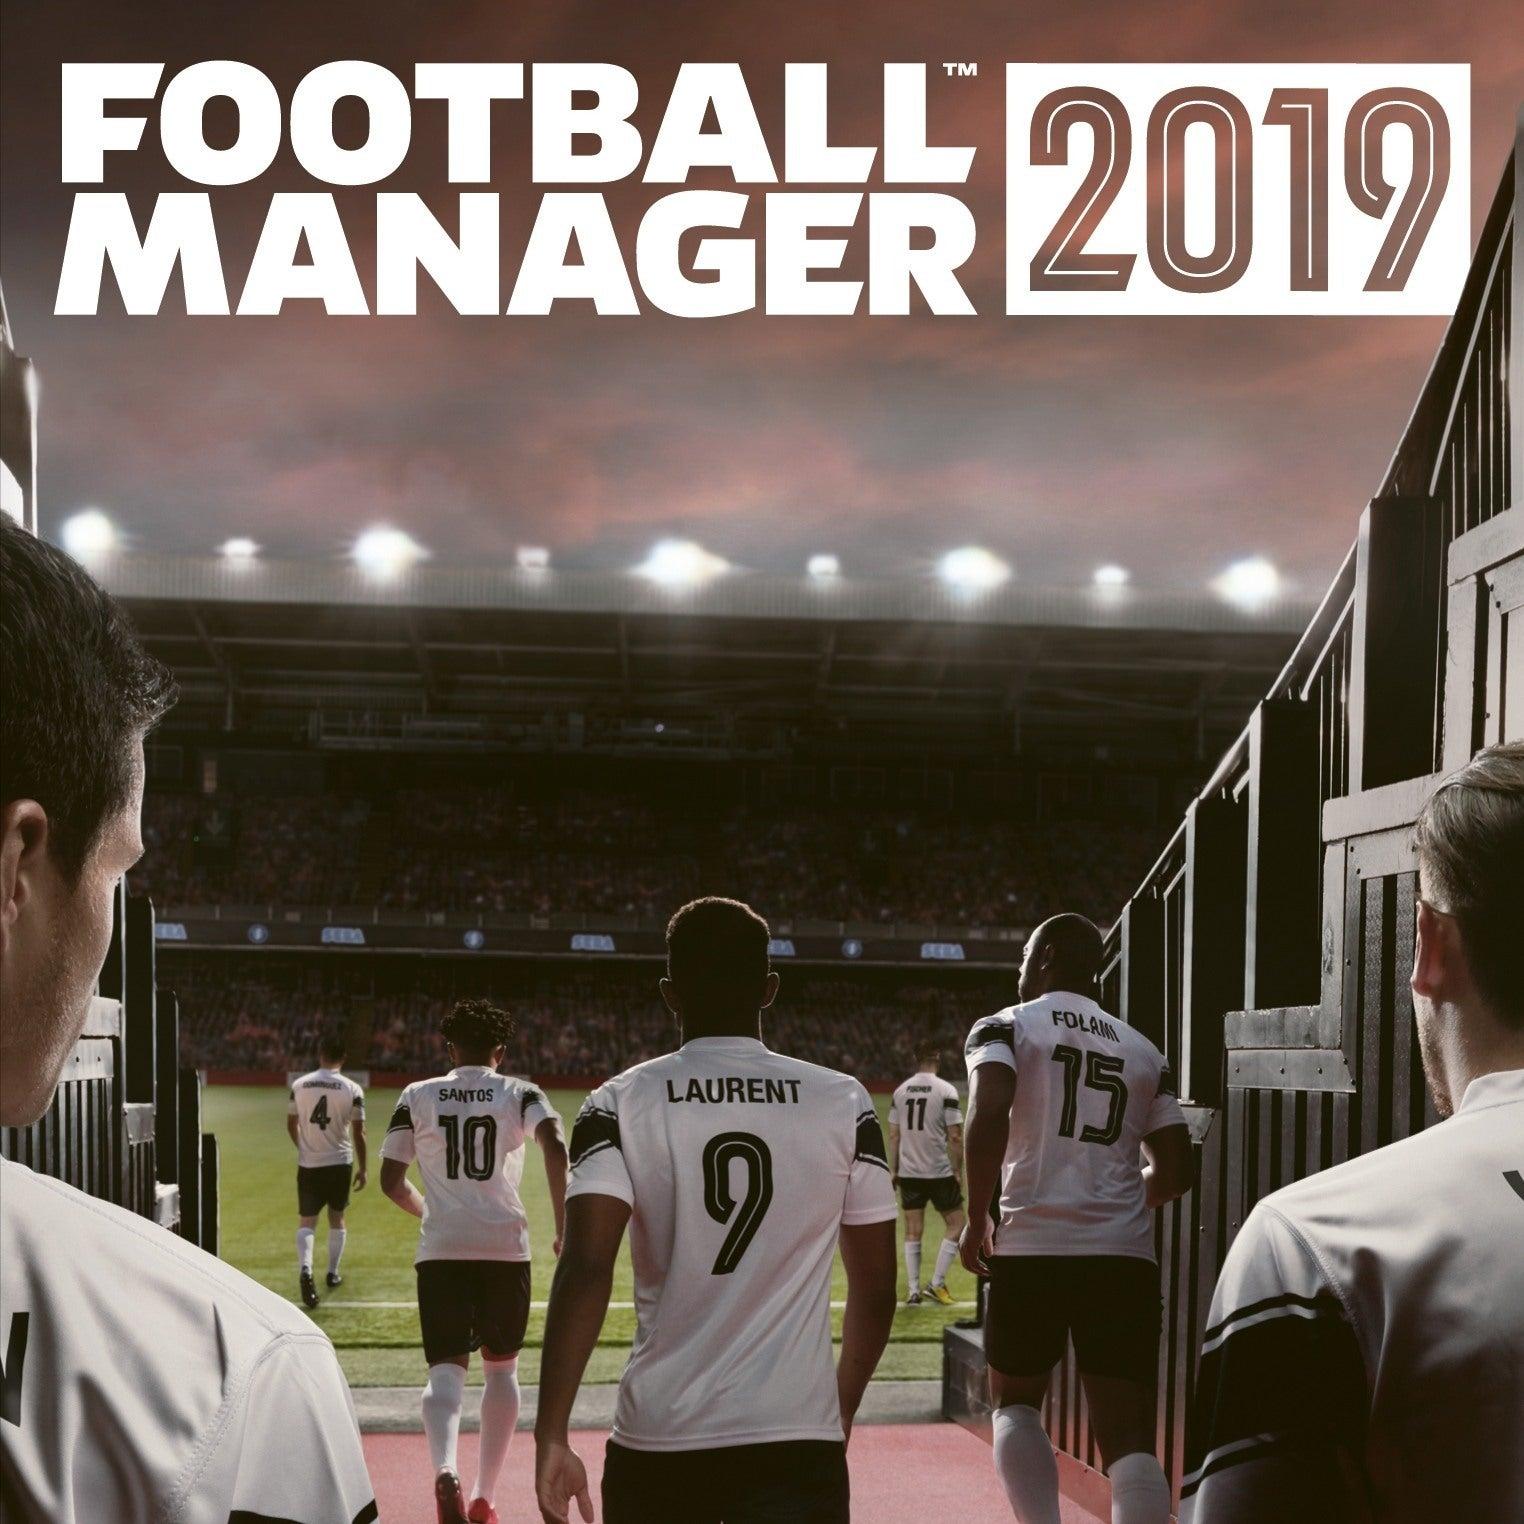 Football Manager 2019 (Steam key) £8.79 @ CDKeys